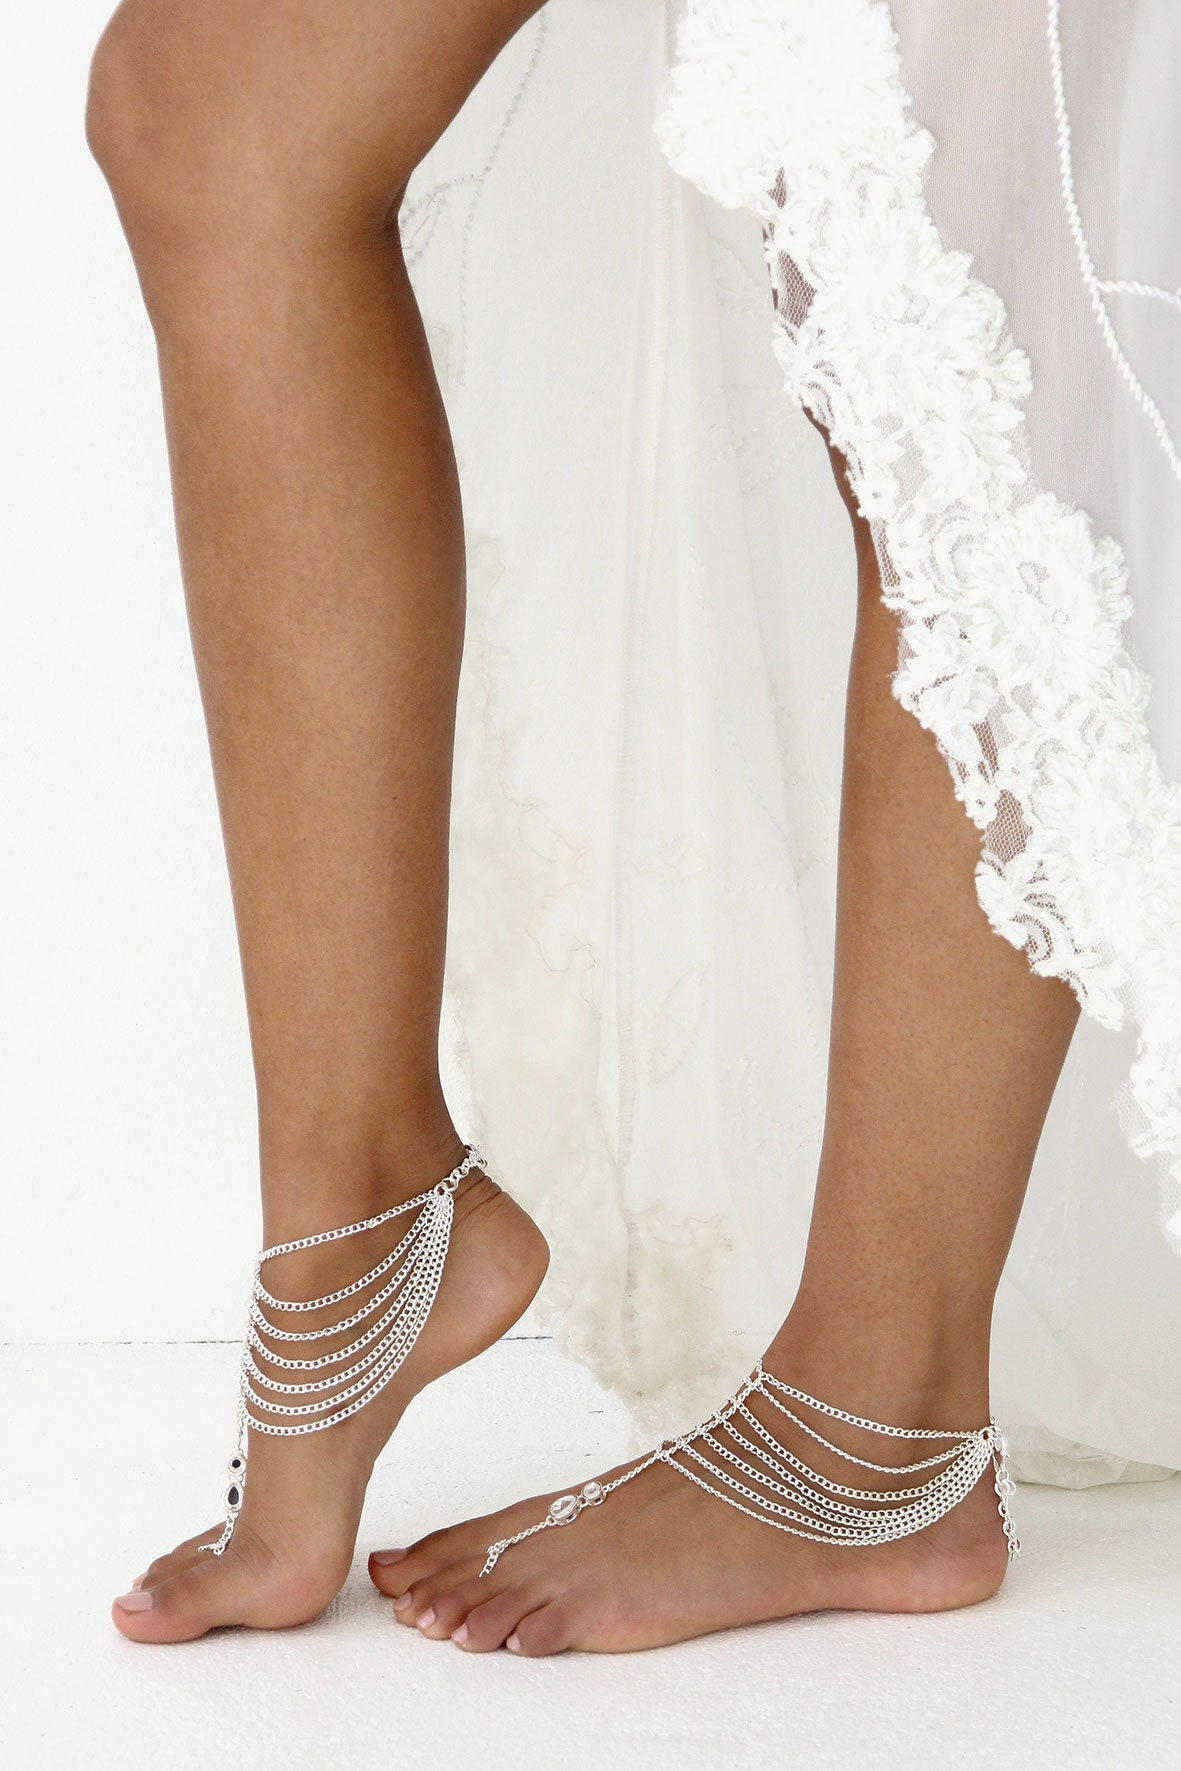 Silver Barefoot Sandals, Bohemian Bride, Beach Shoes, Bride, Beach Wedding, Bridal Shoes, Beach Wedding Shoes, Barefoot Shoes, Jewellery, Style: Cherish. 0d6d9b